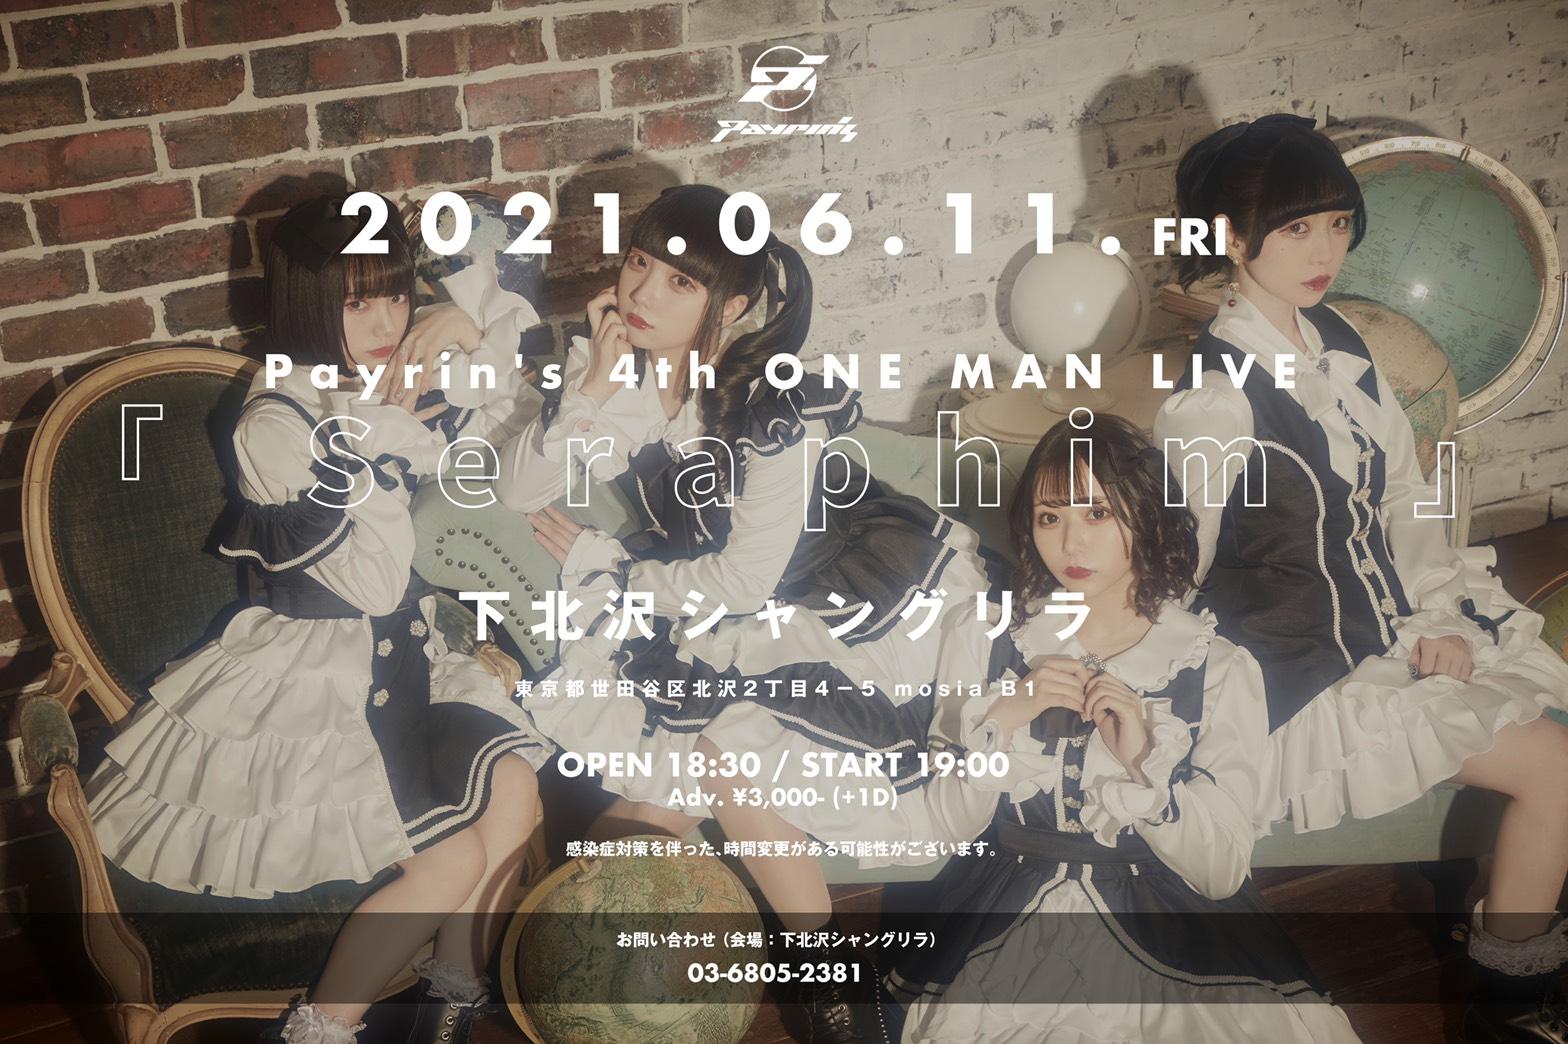 Payrin's 4th ONEMAN LIVE 「Seraphim」